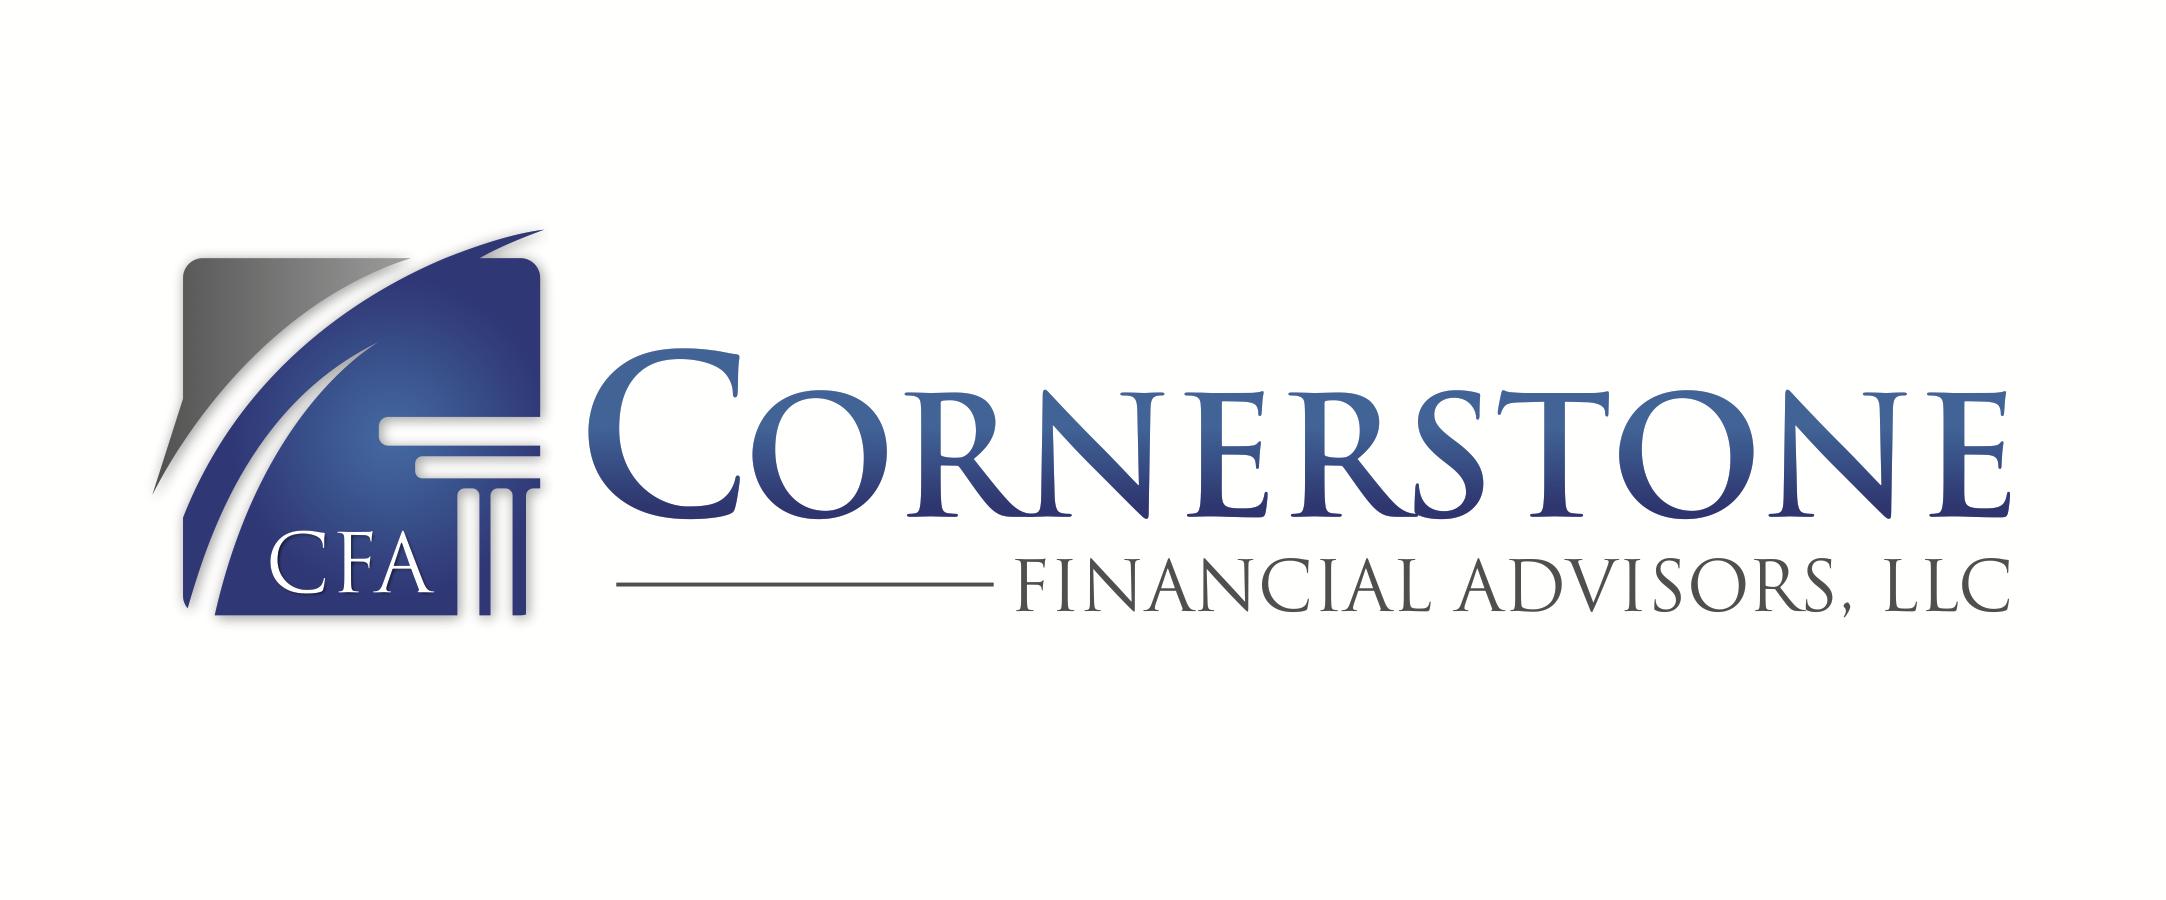 Cornerstone Financial Advisors, LLC